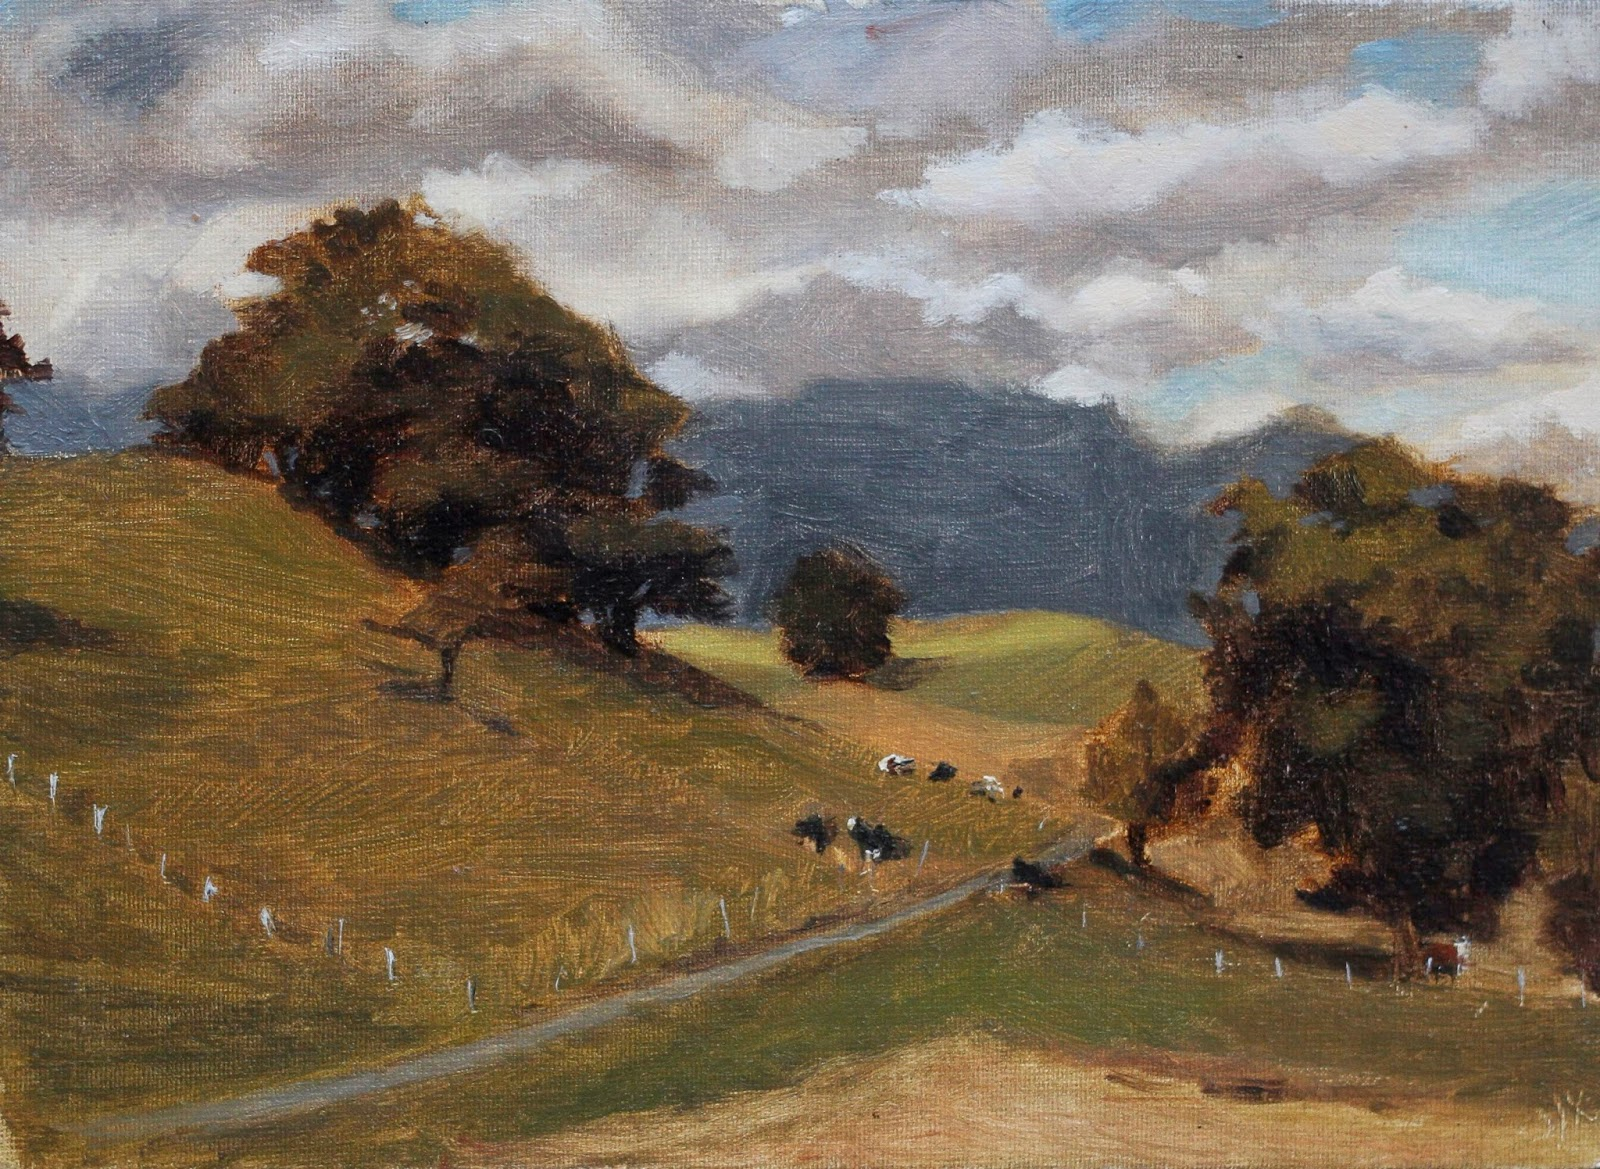 lavey-village, oil on linen panel, 2013